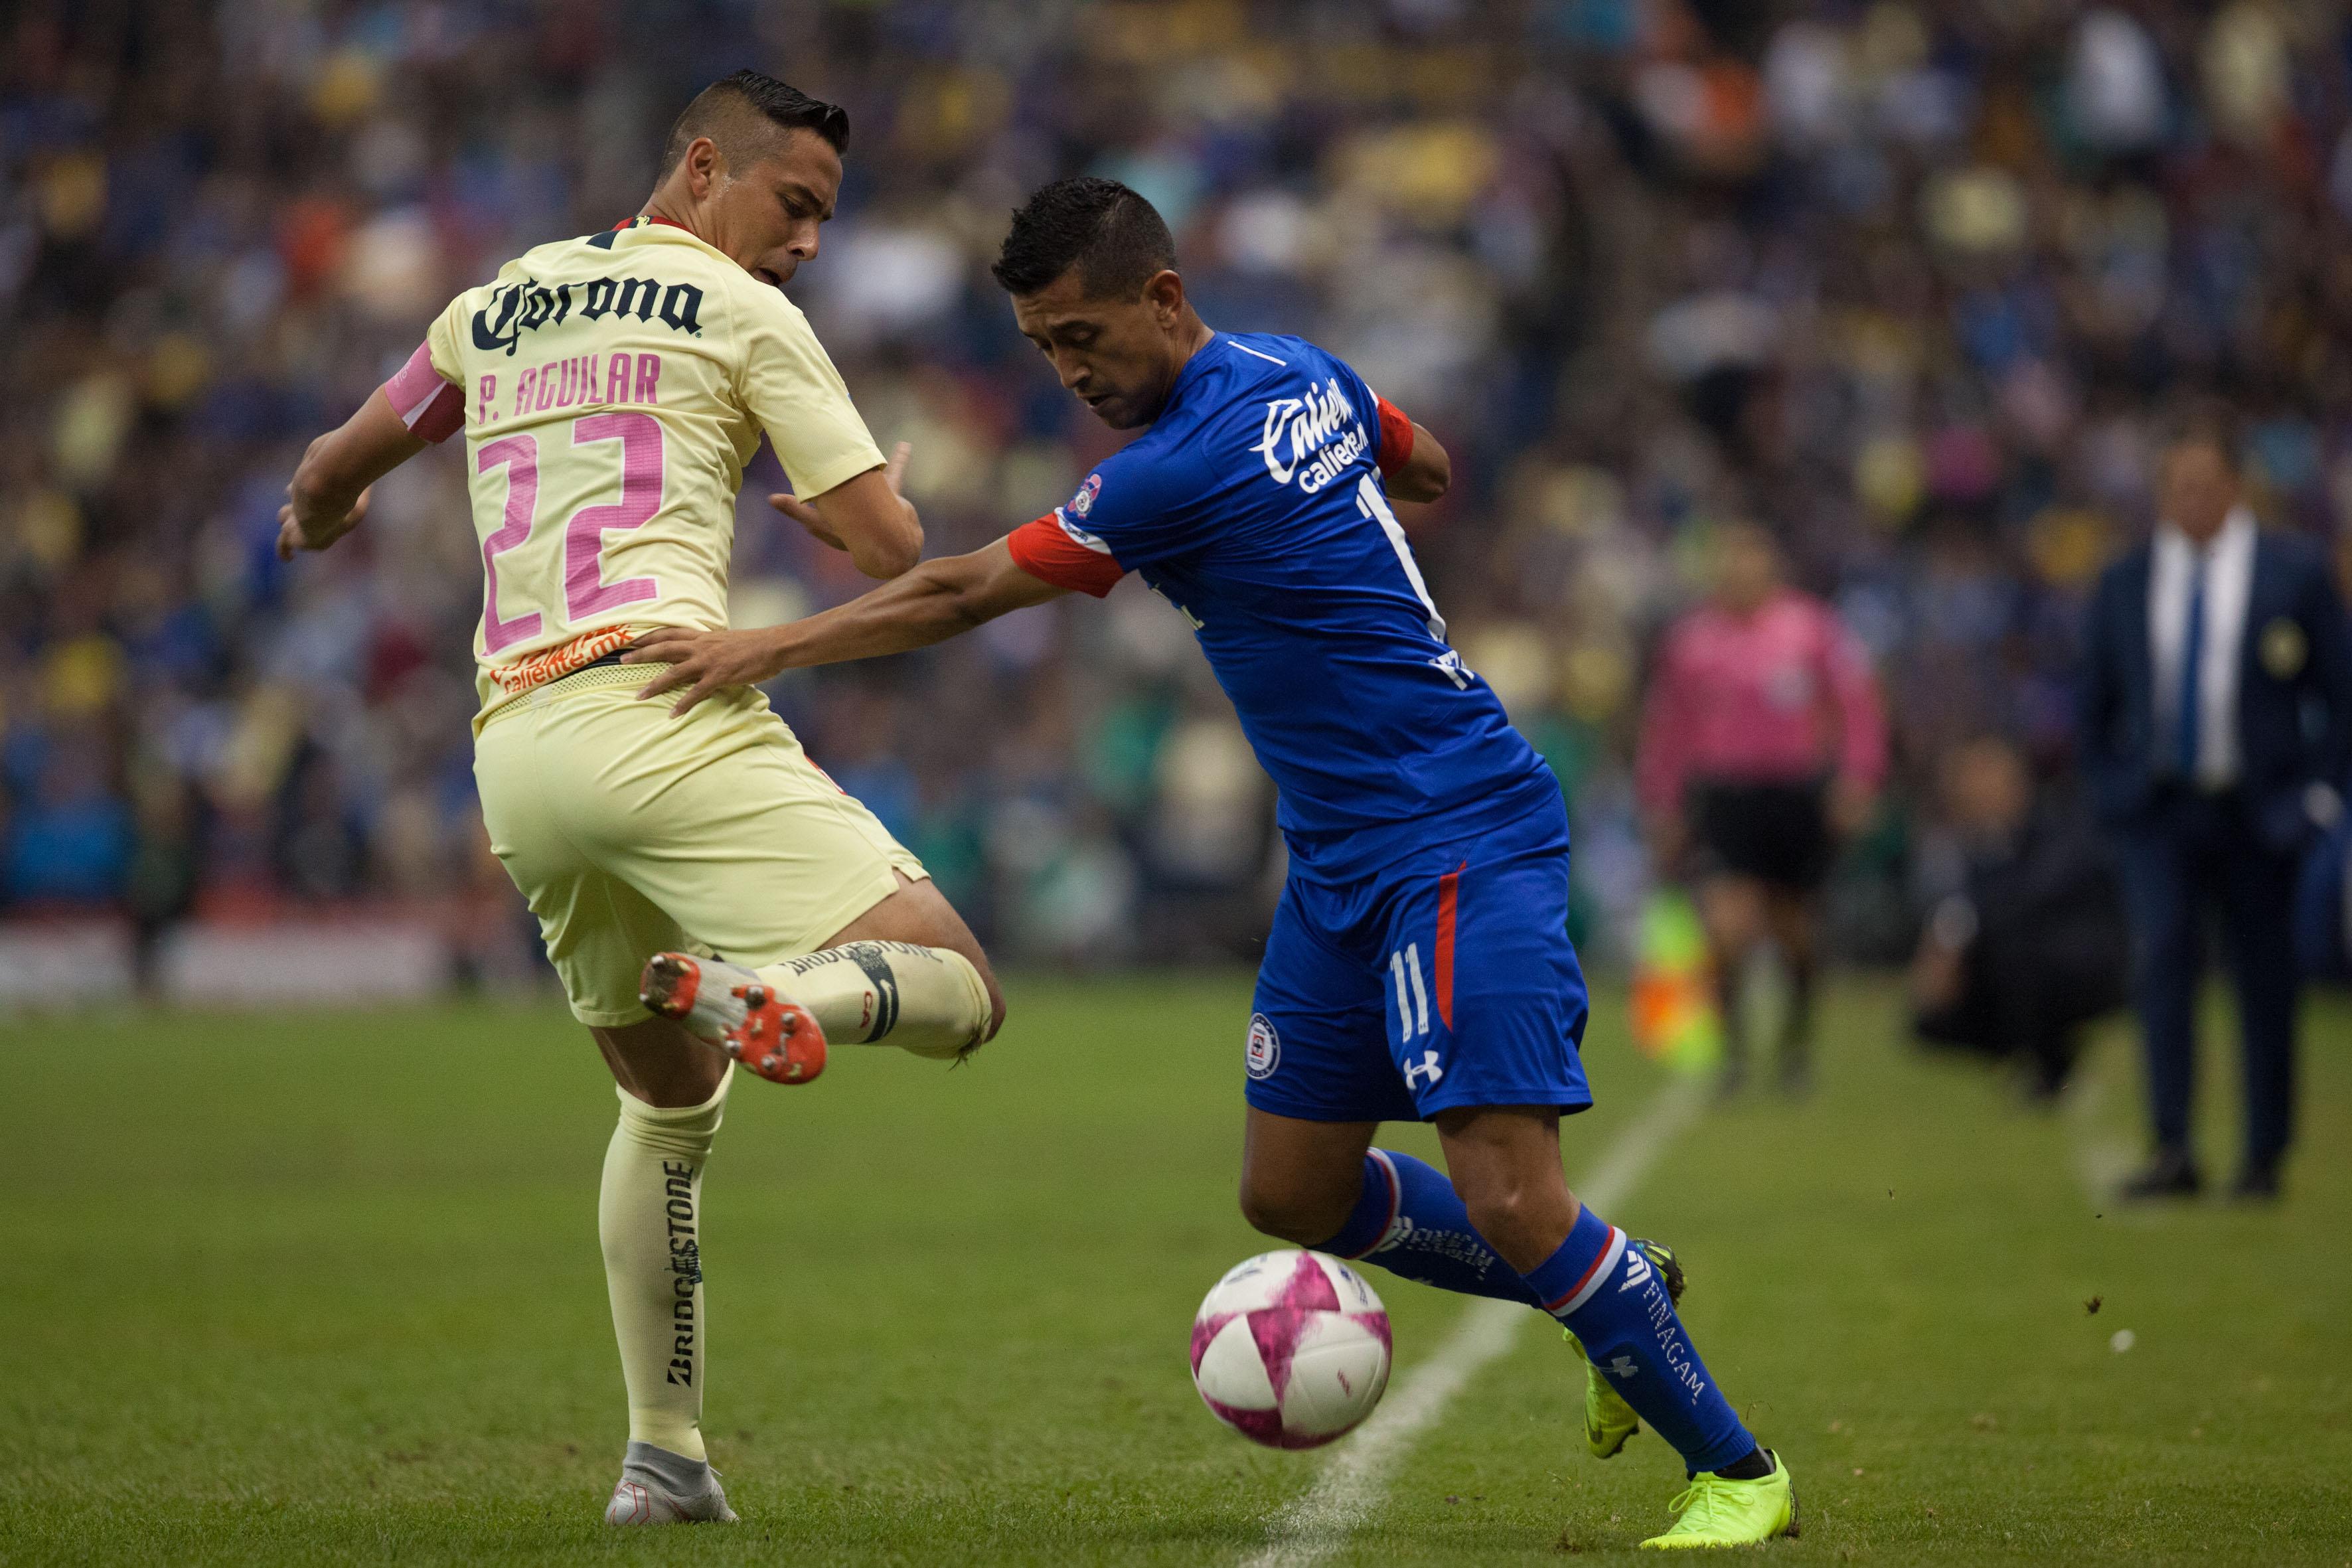 Cruz Azul, America, Apertura 218, Final Los Pleyers